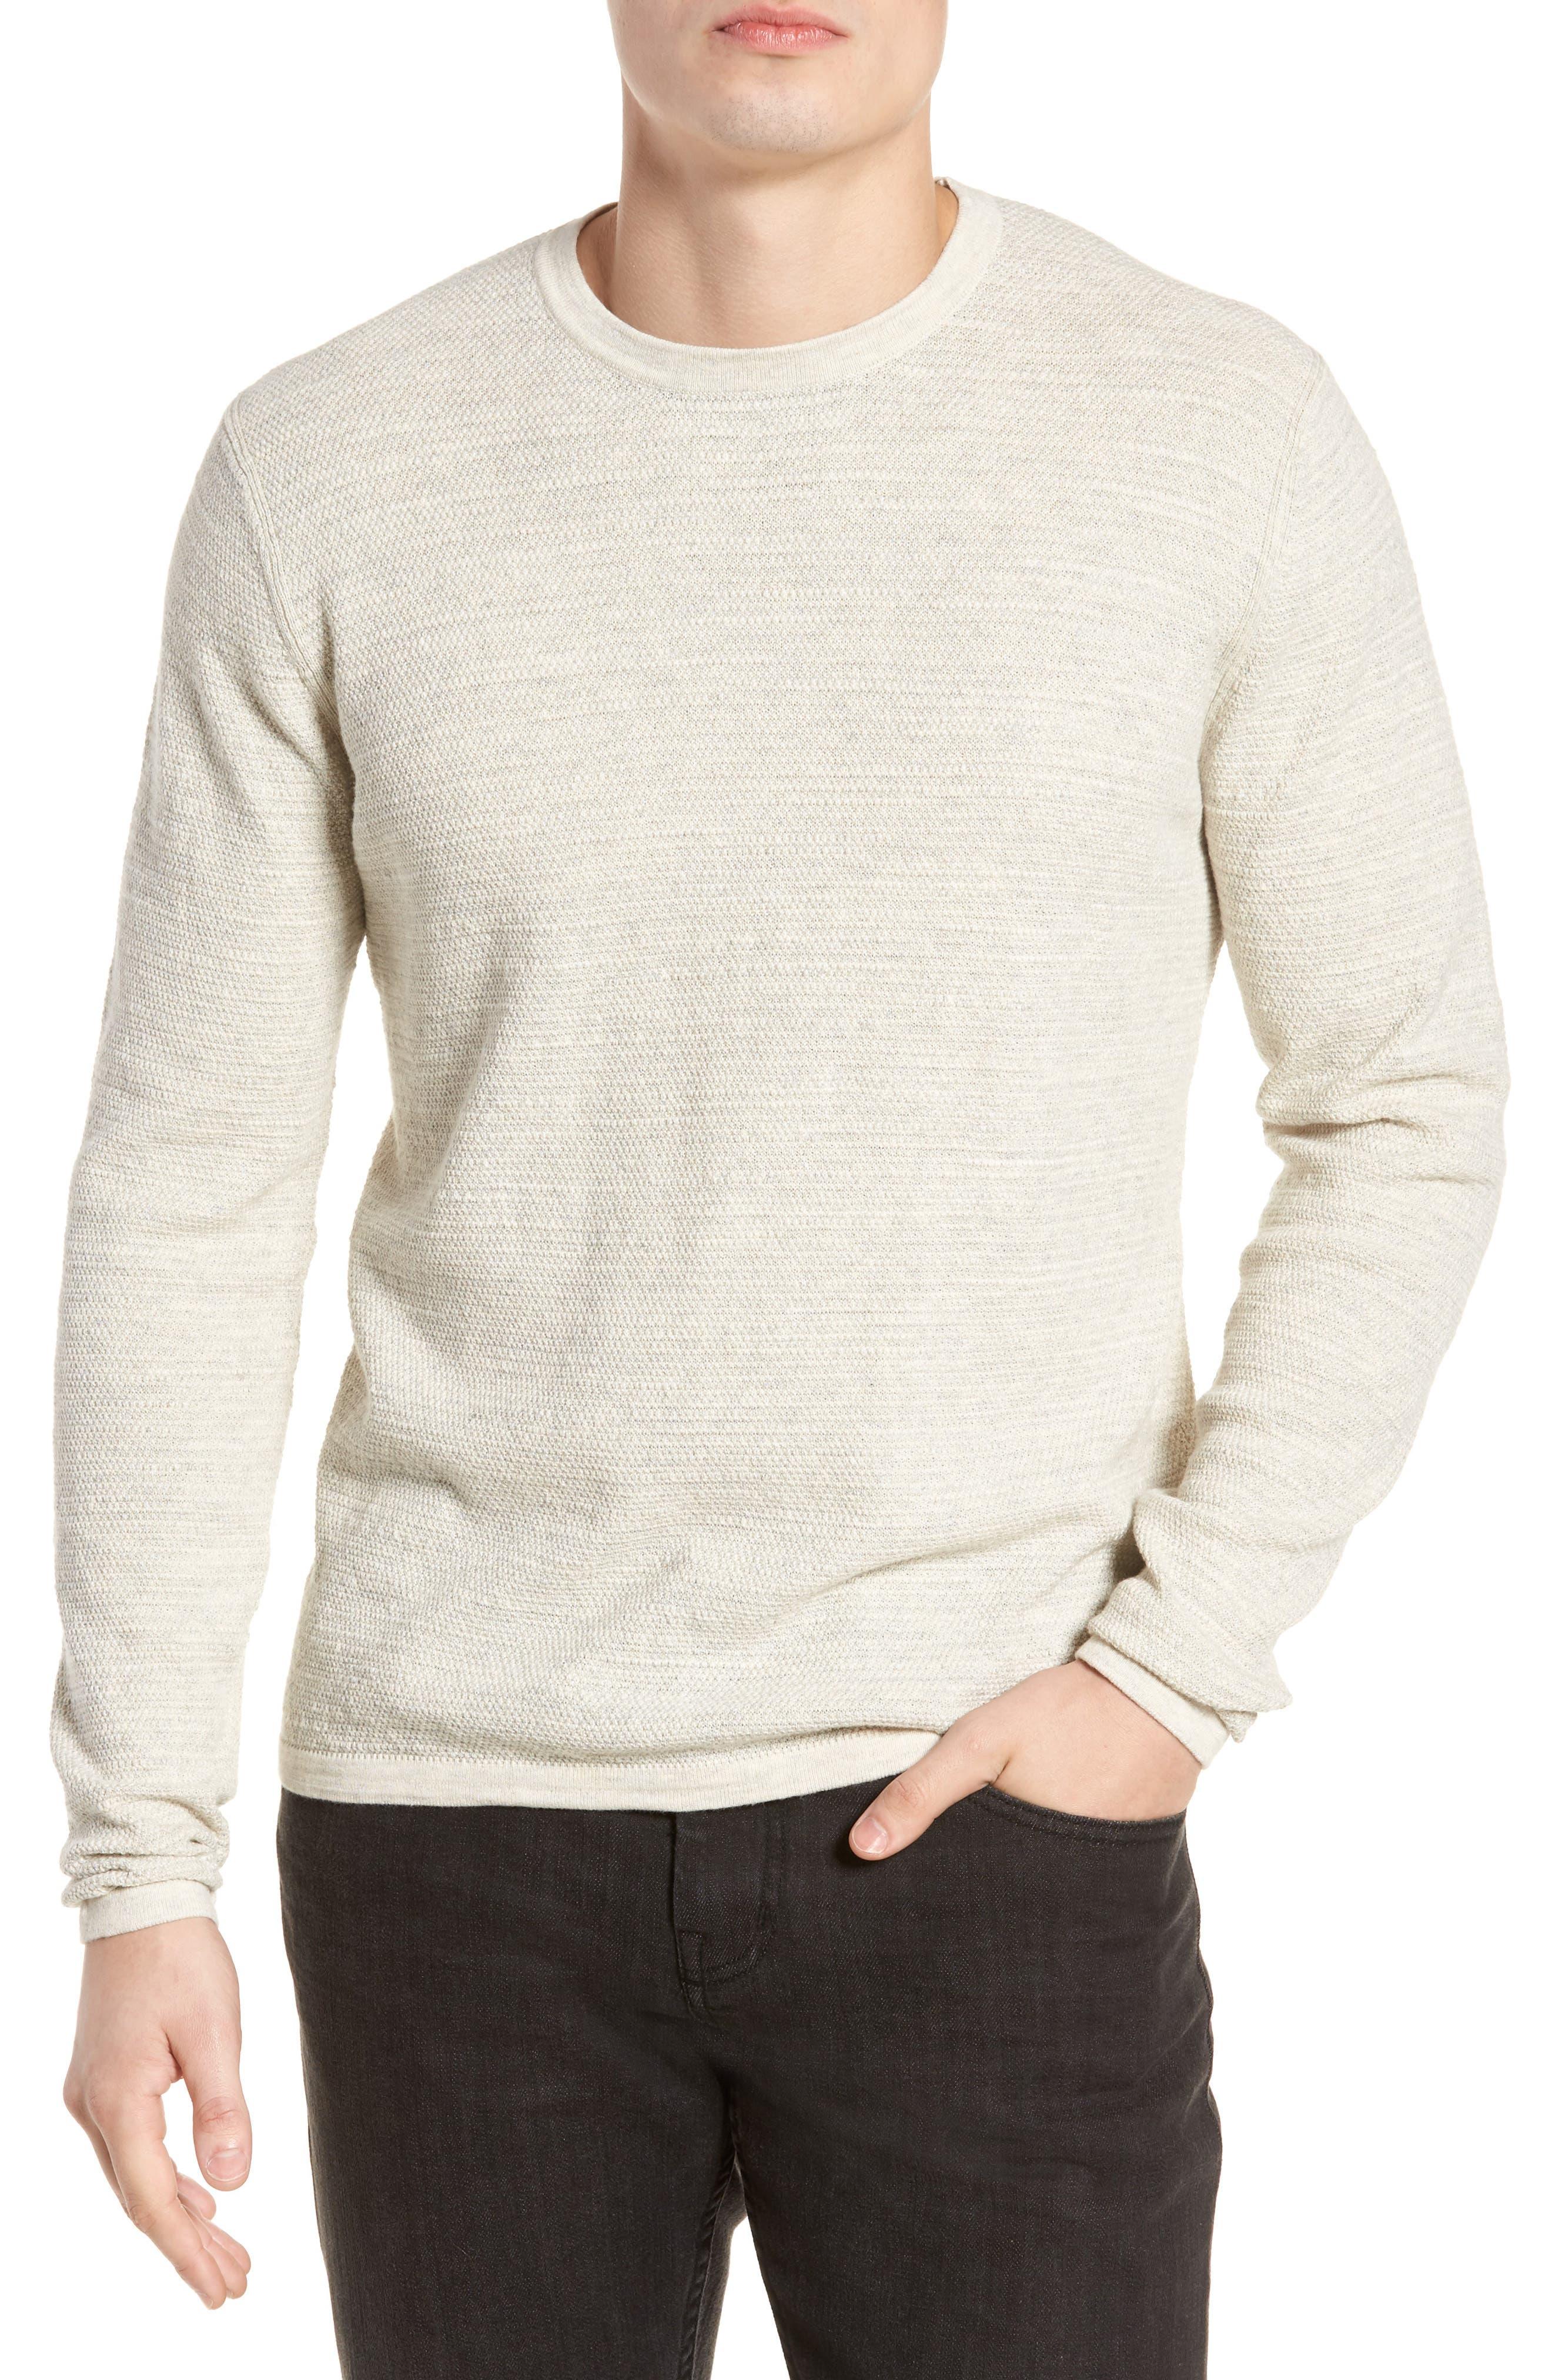 Grayers Slub Thermal Knit Sweater